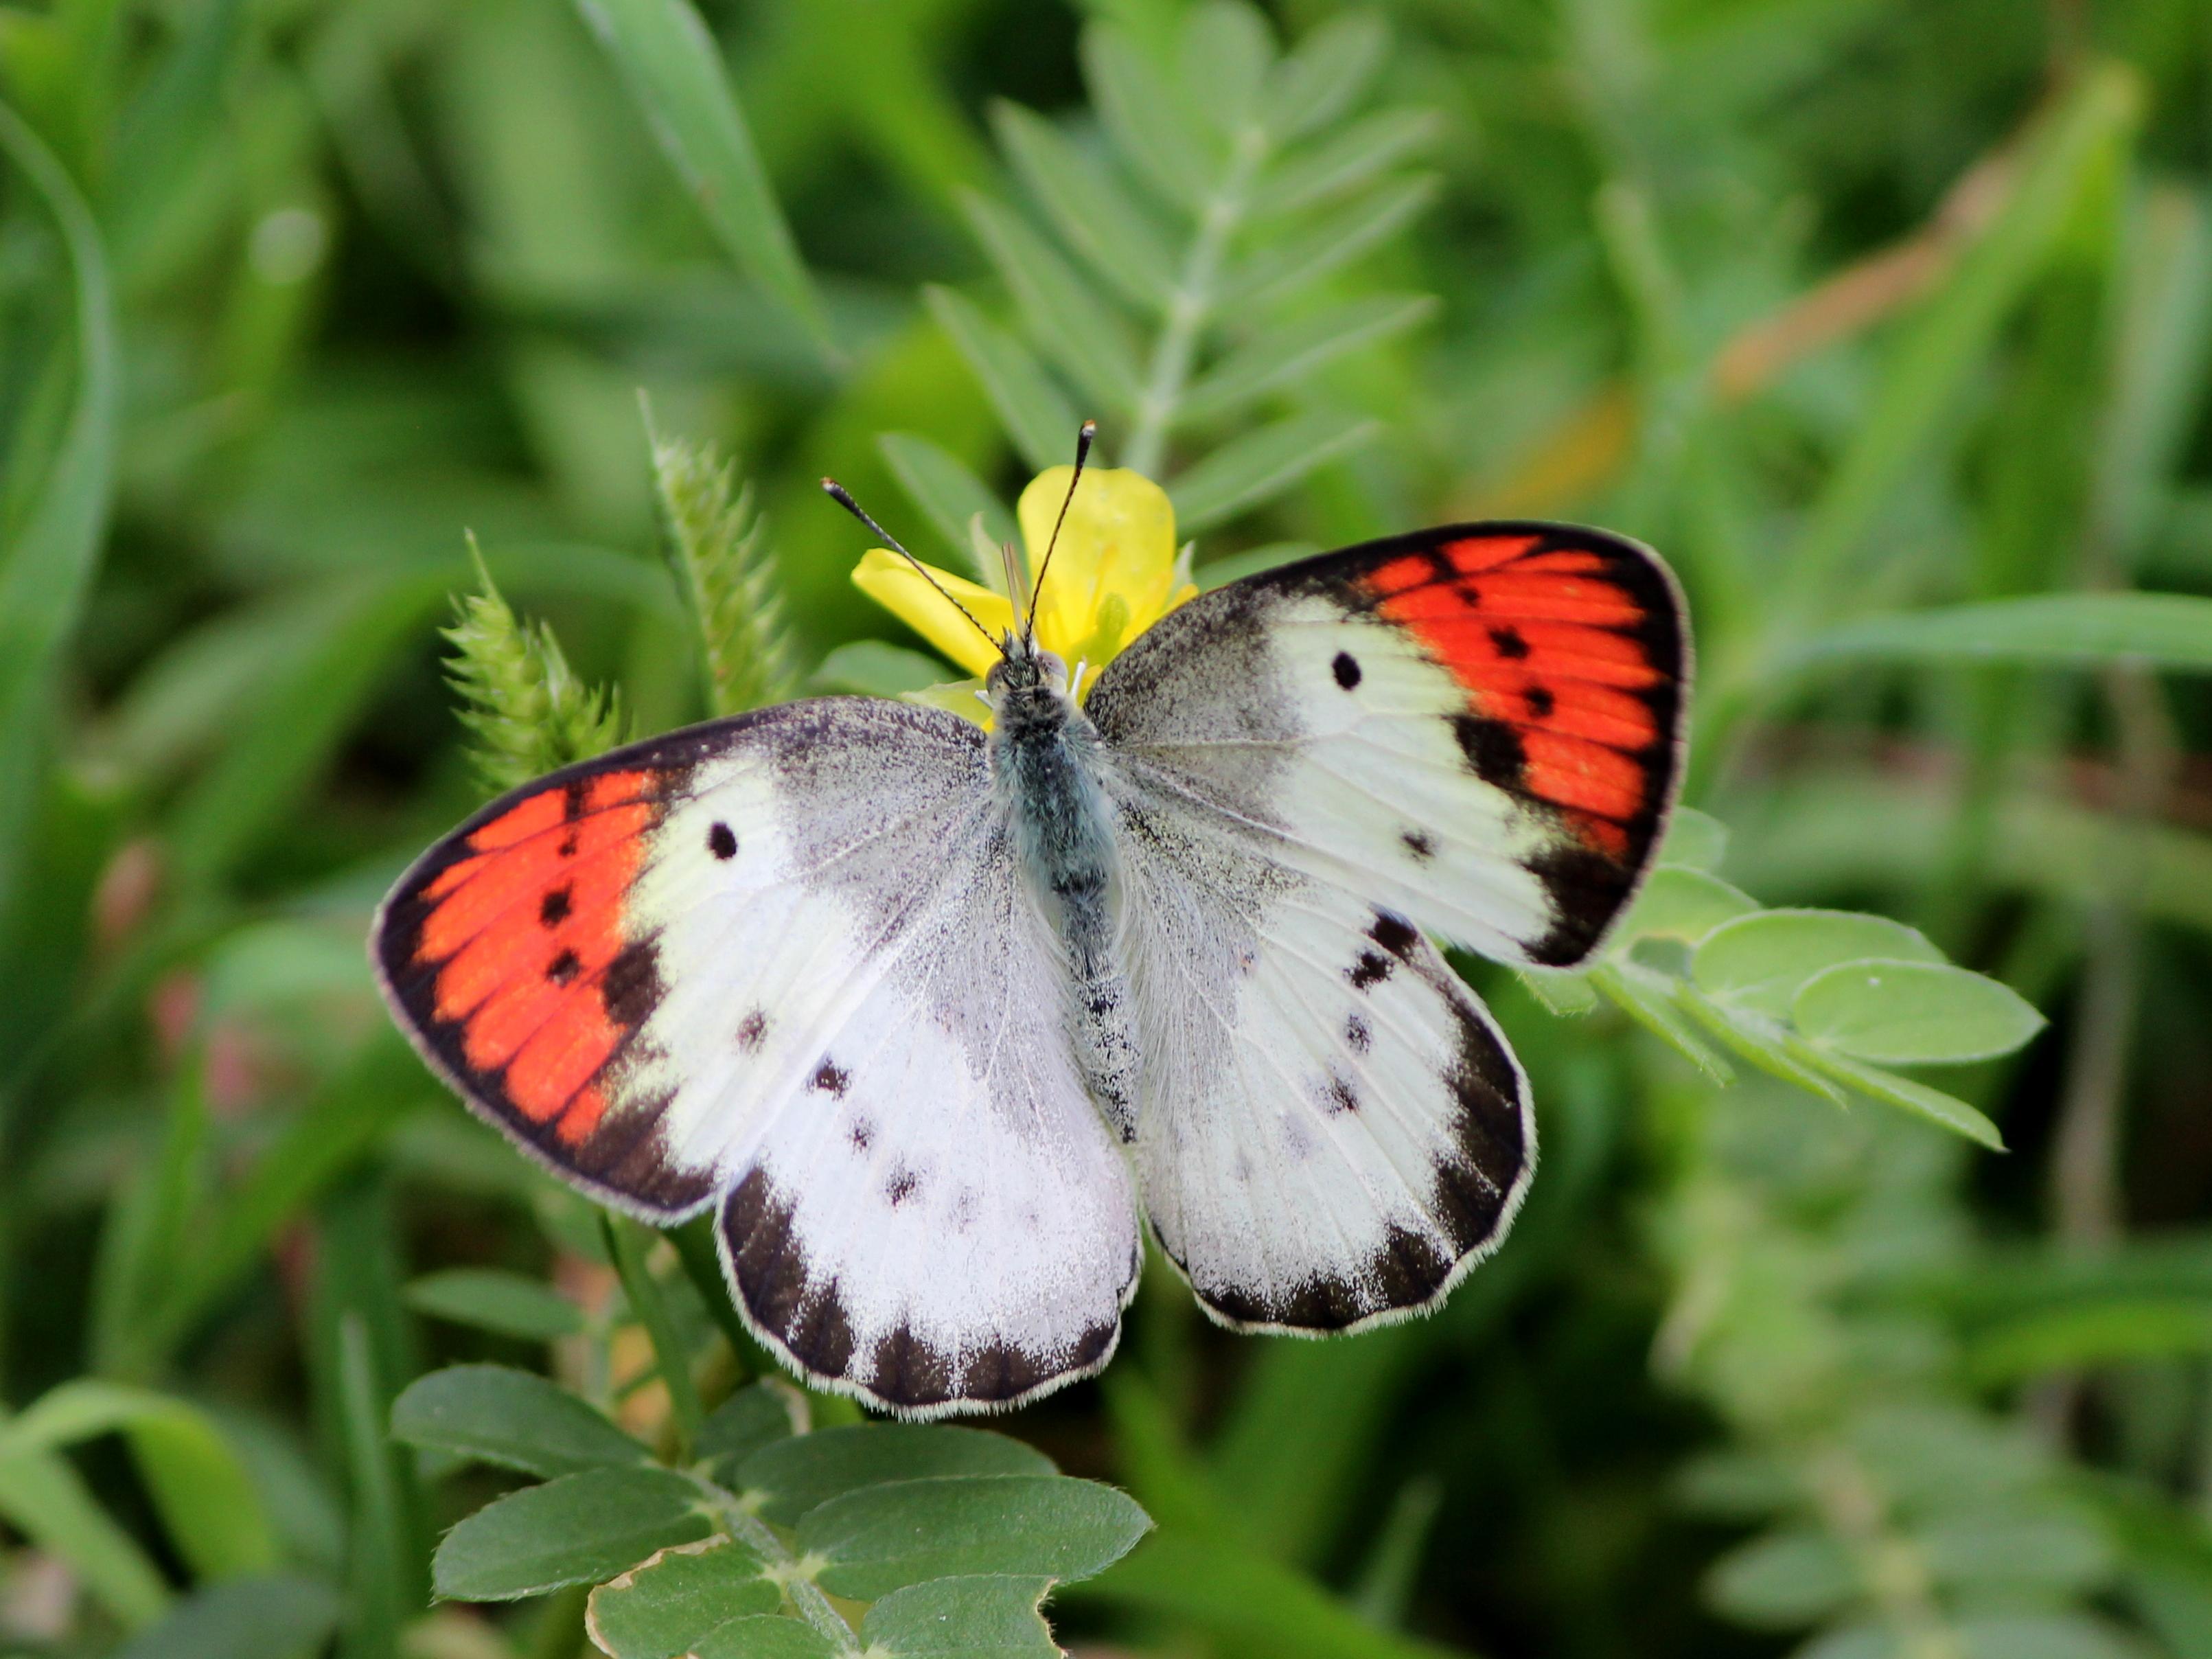 Sưu tập Bộ cánh vảy 3 - Page 7 Flora_and_Fauna_Savandurga_Karnataka_%285%29